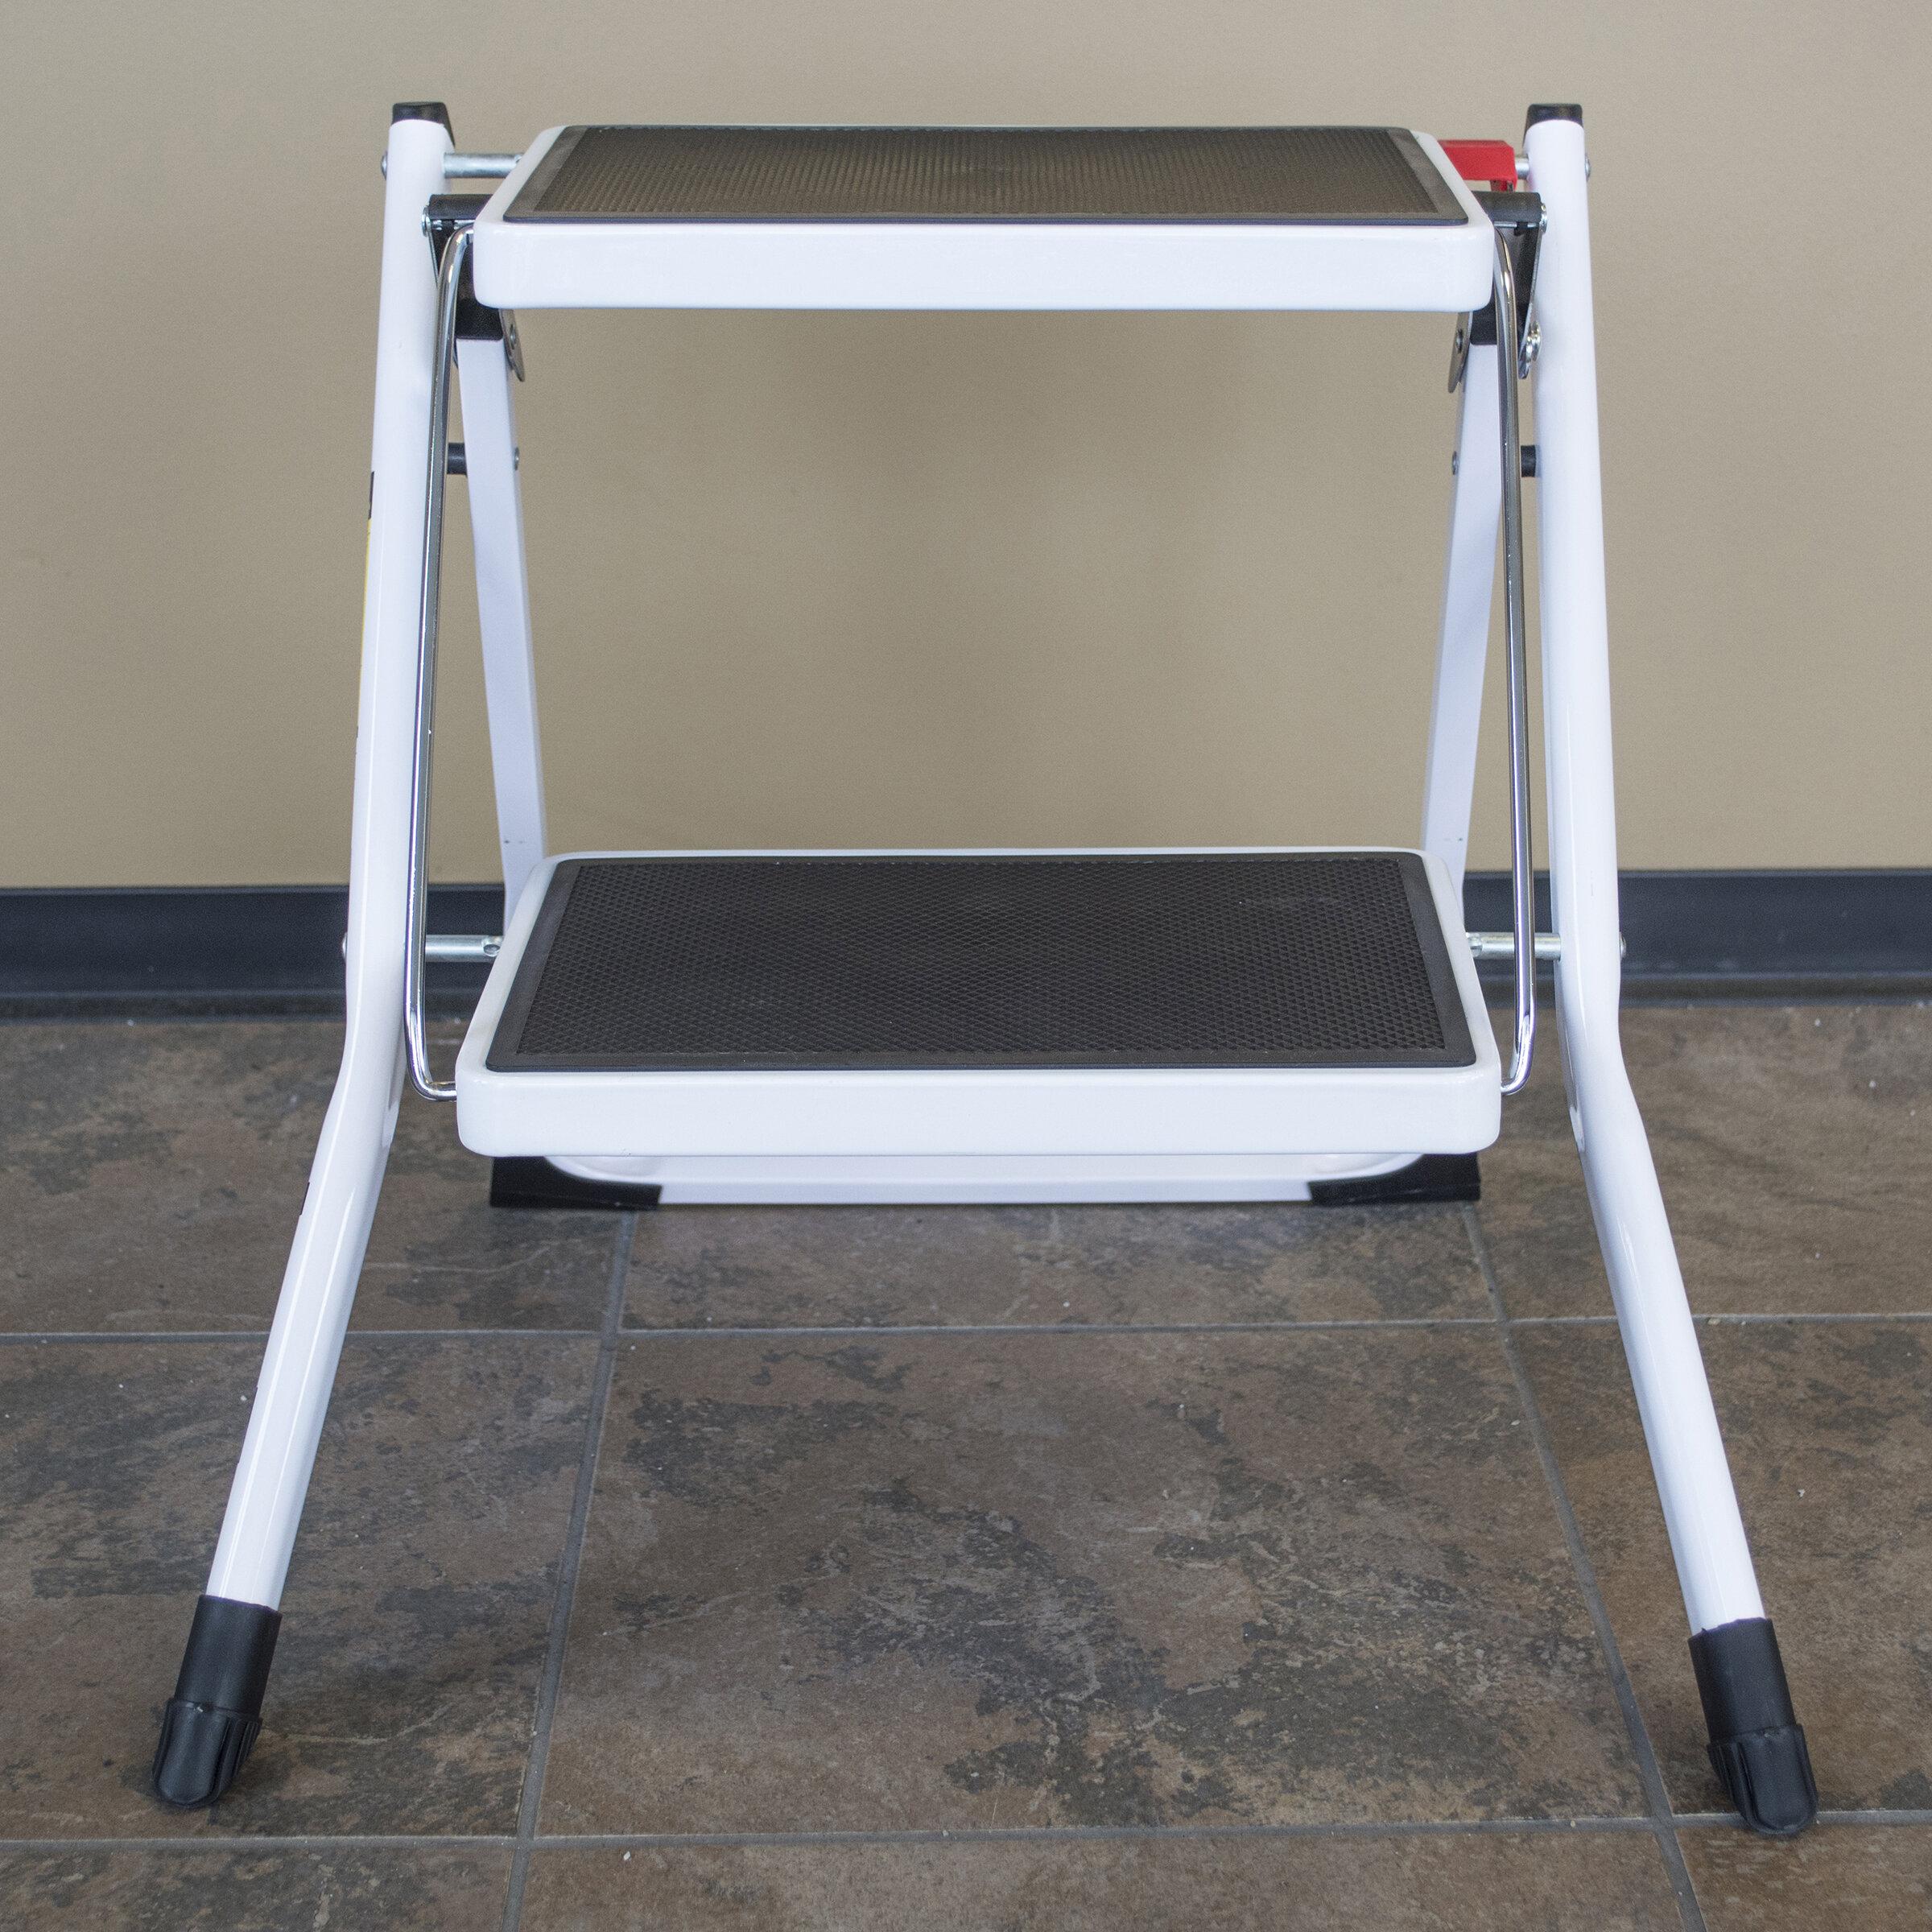 Wondrous 2 Step Steel Step Stool With 225 Lb Load Capacity Creativecarmelina Interior Chair Design Creativecarmelinacom